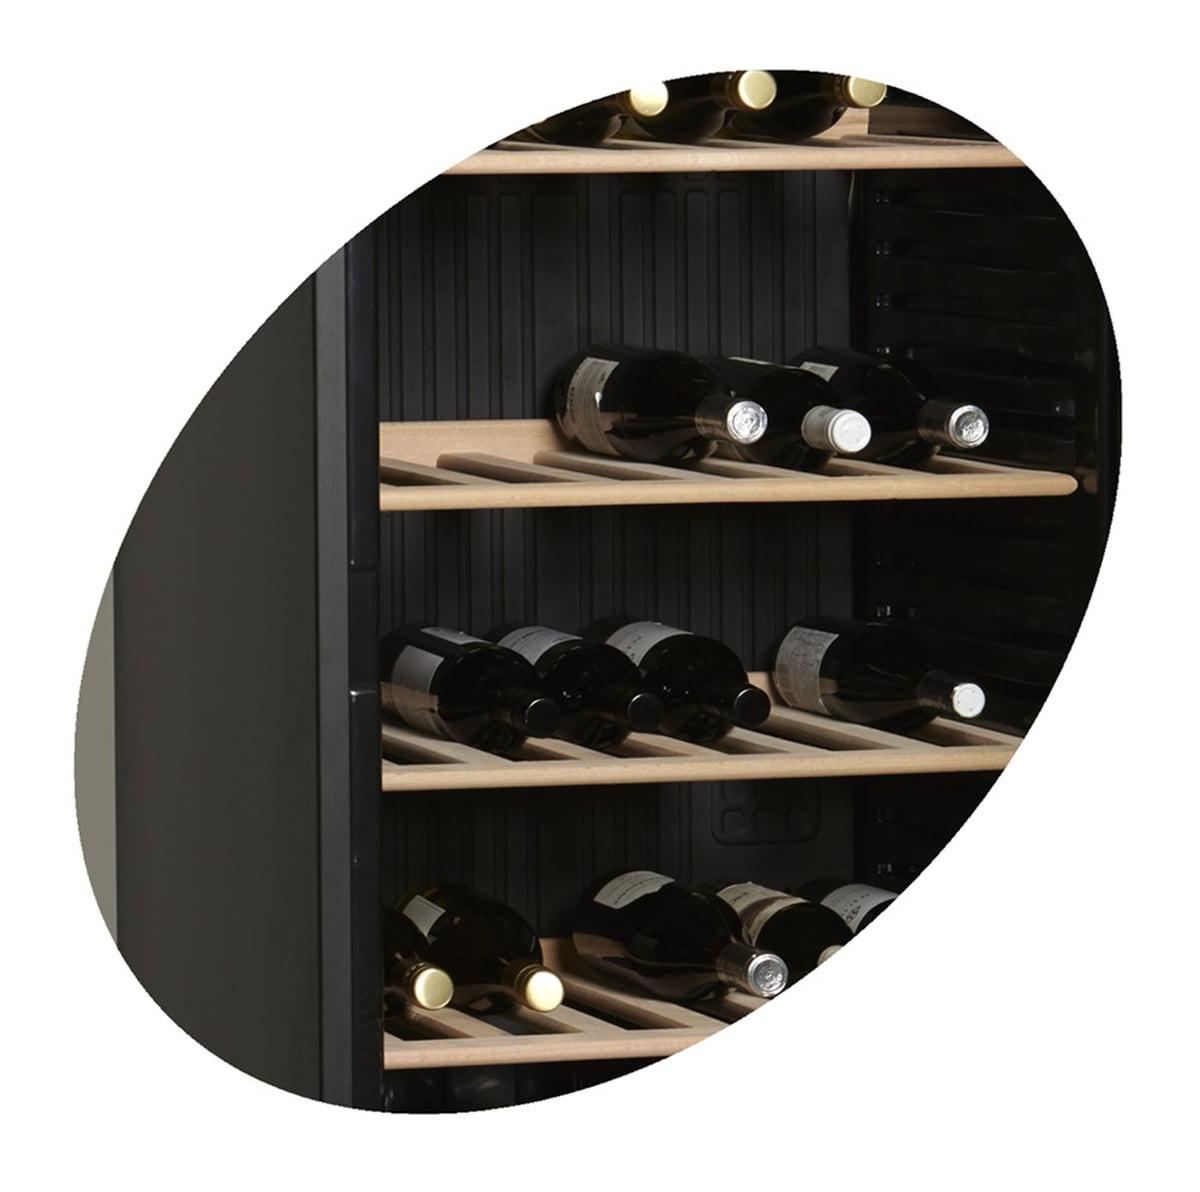 Tefcold vinskap sort 1 sone 184 cm CPP1380